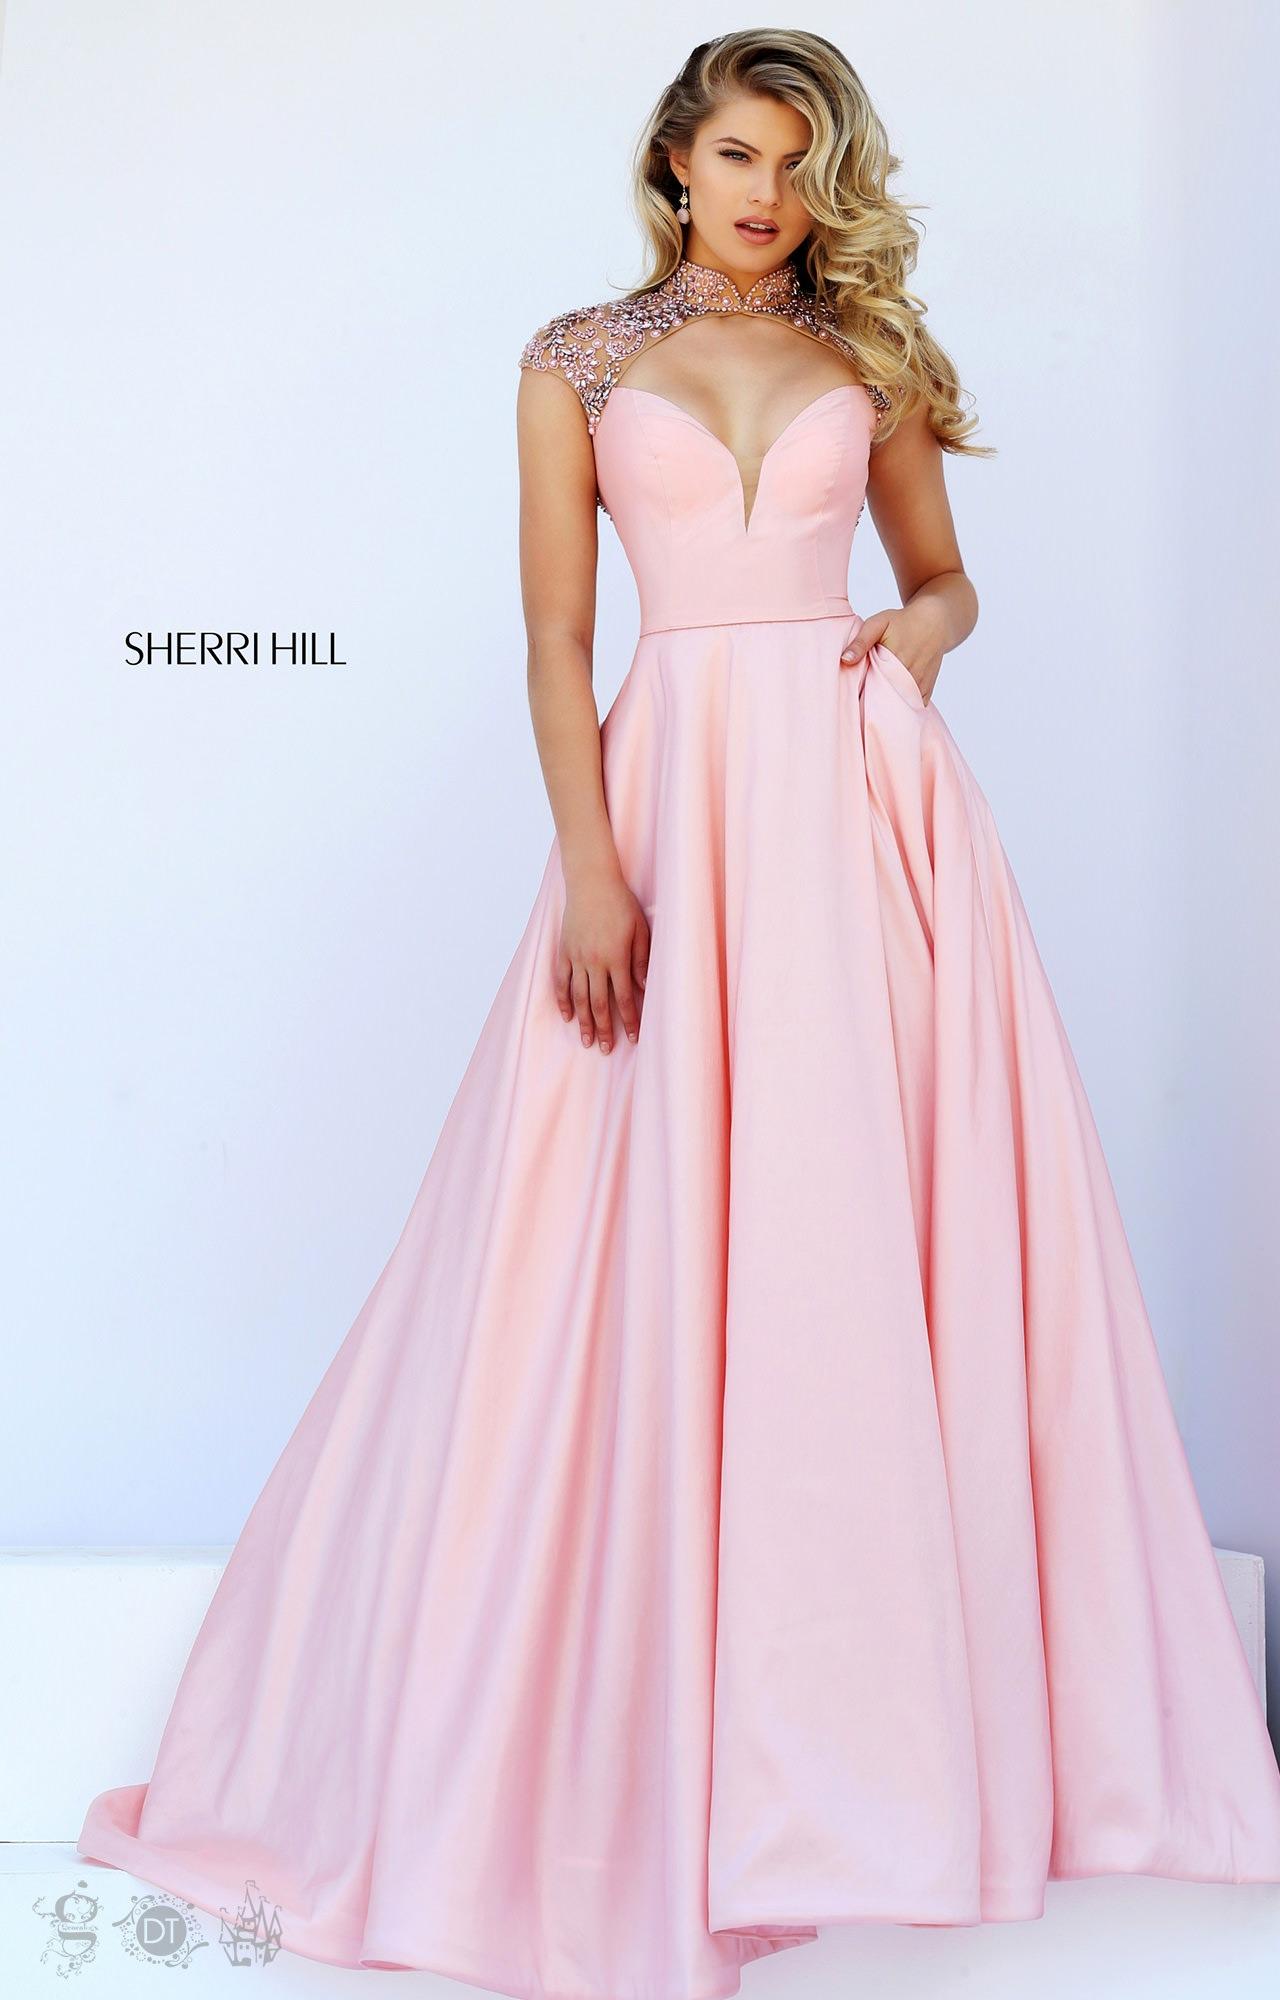 Excepcional Sherri Hill Prom Dresses For Cheap Inspiración ...